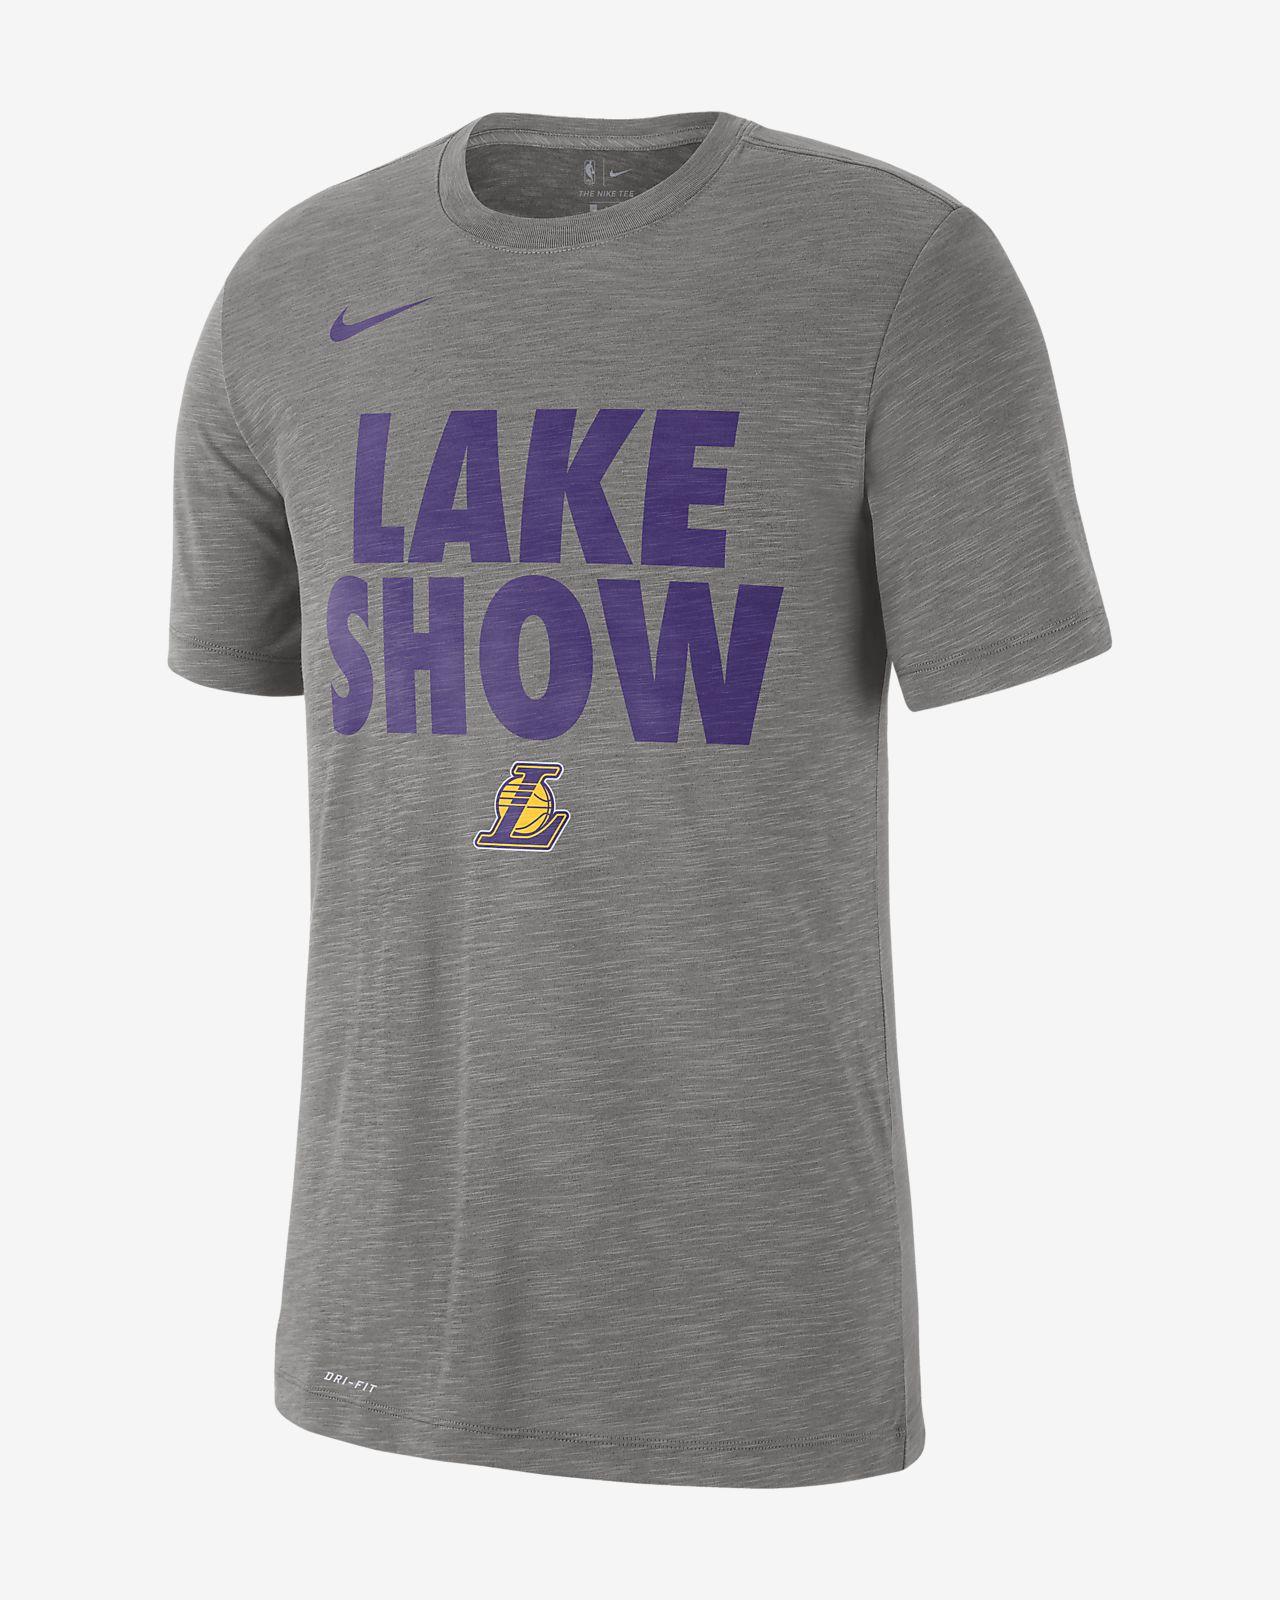 2c46a944d Los Angeles Lakers Nike Dri-FIT Men s NBA T-Shirt. Nike.com VN